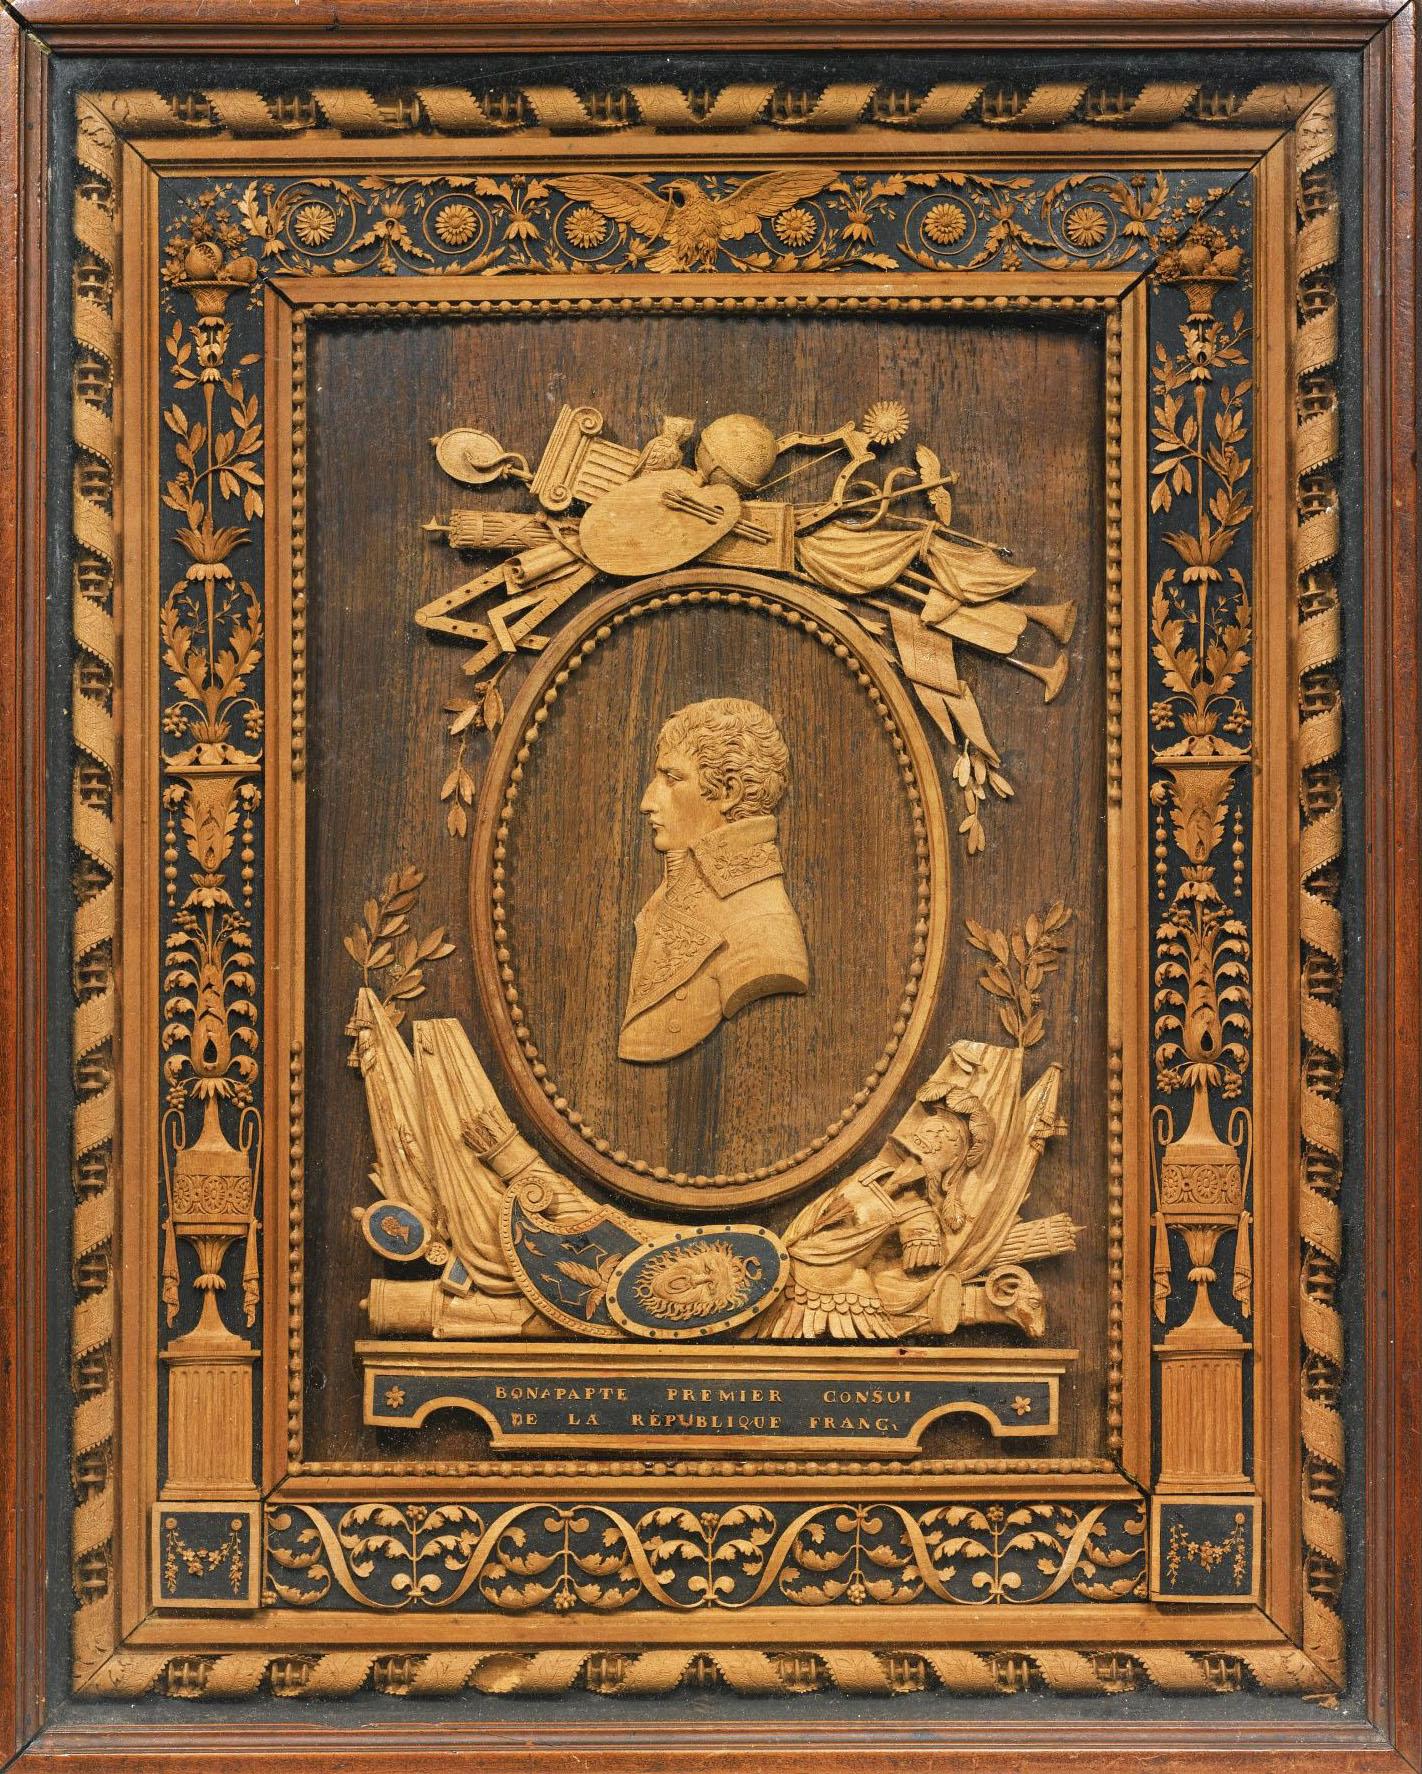 13 Bonzanigo Napoleón as First Consul of the French Republic c1800 33x26.7cm Art mart 2013